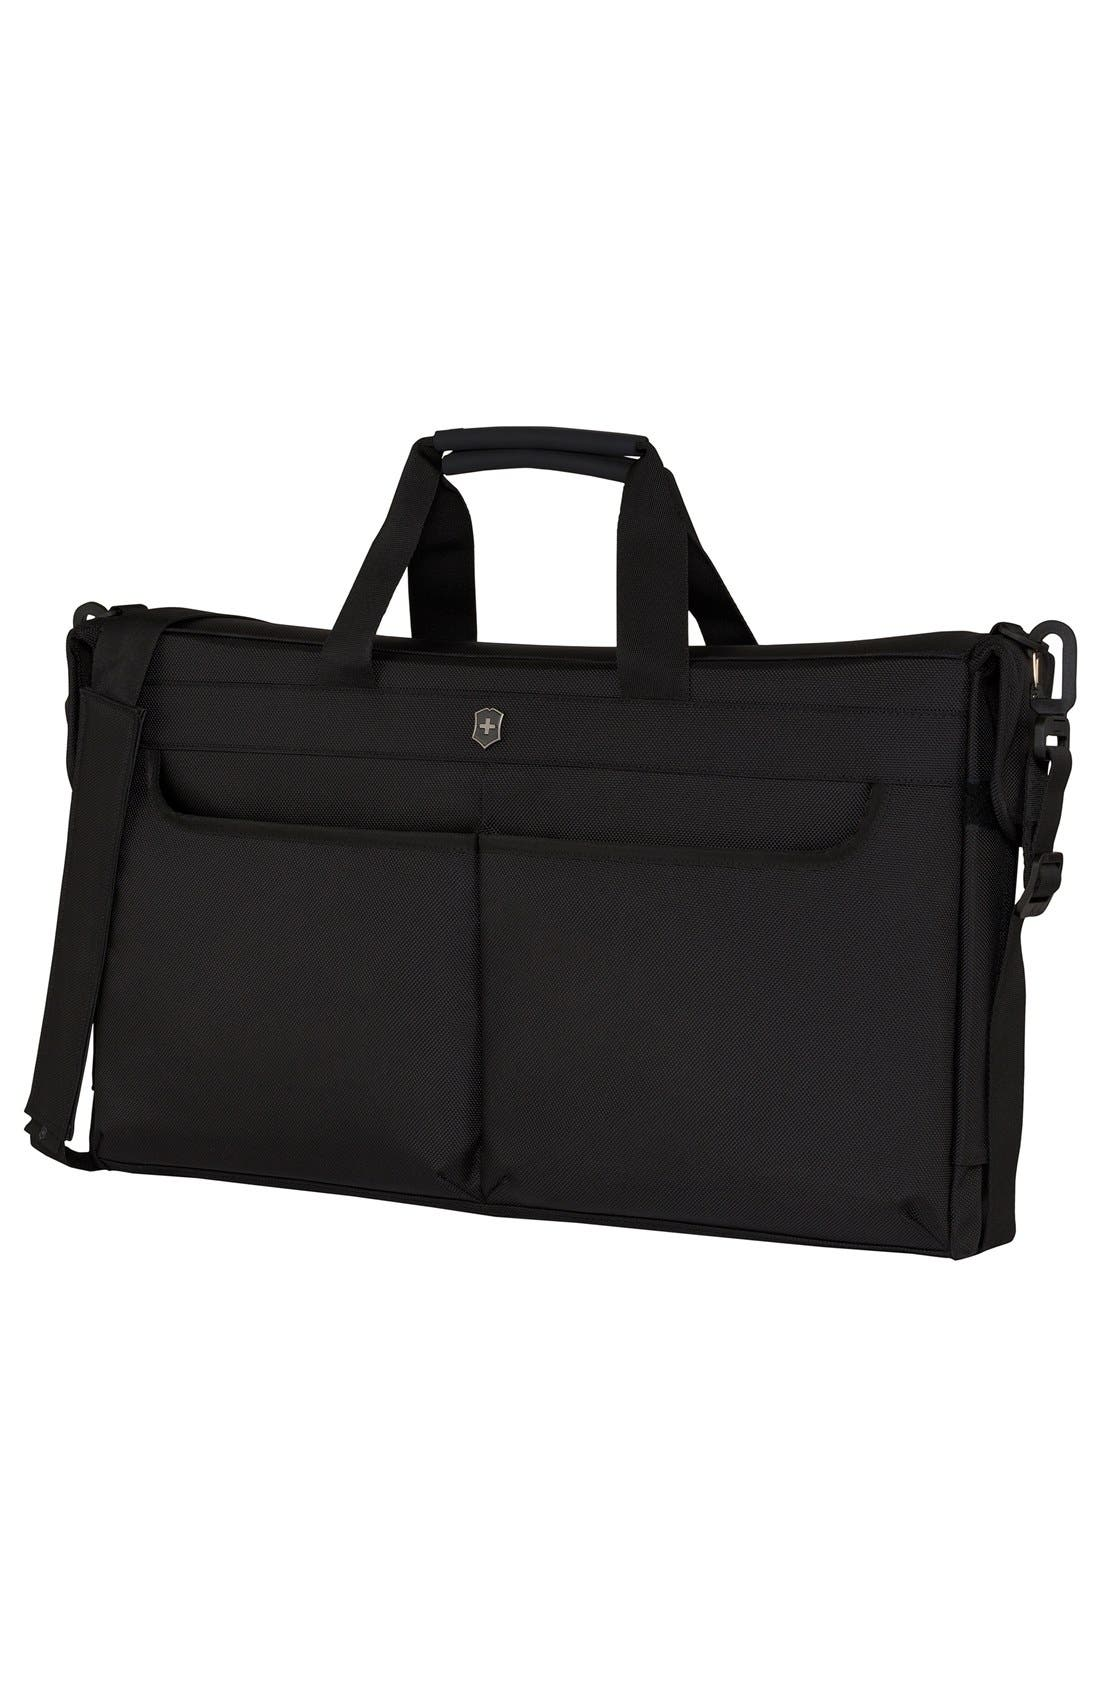 Victorinox Swiss Army® 'WT 5.0 - Porter' Garment Bag